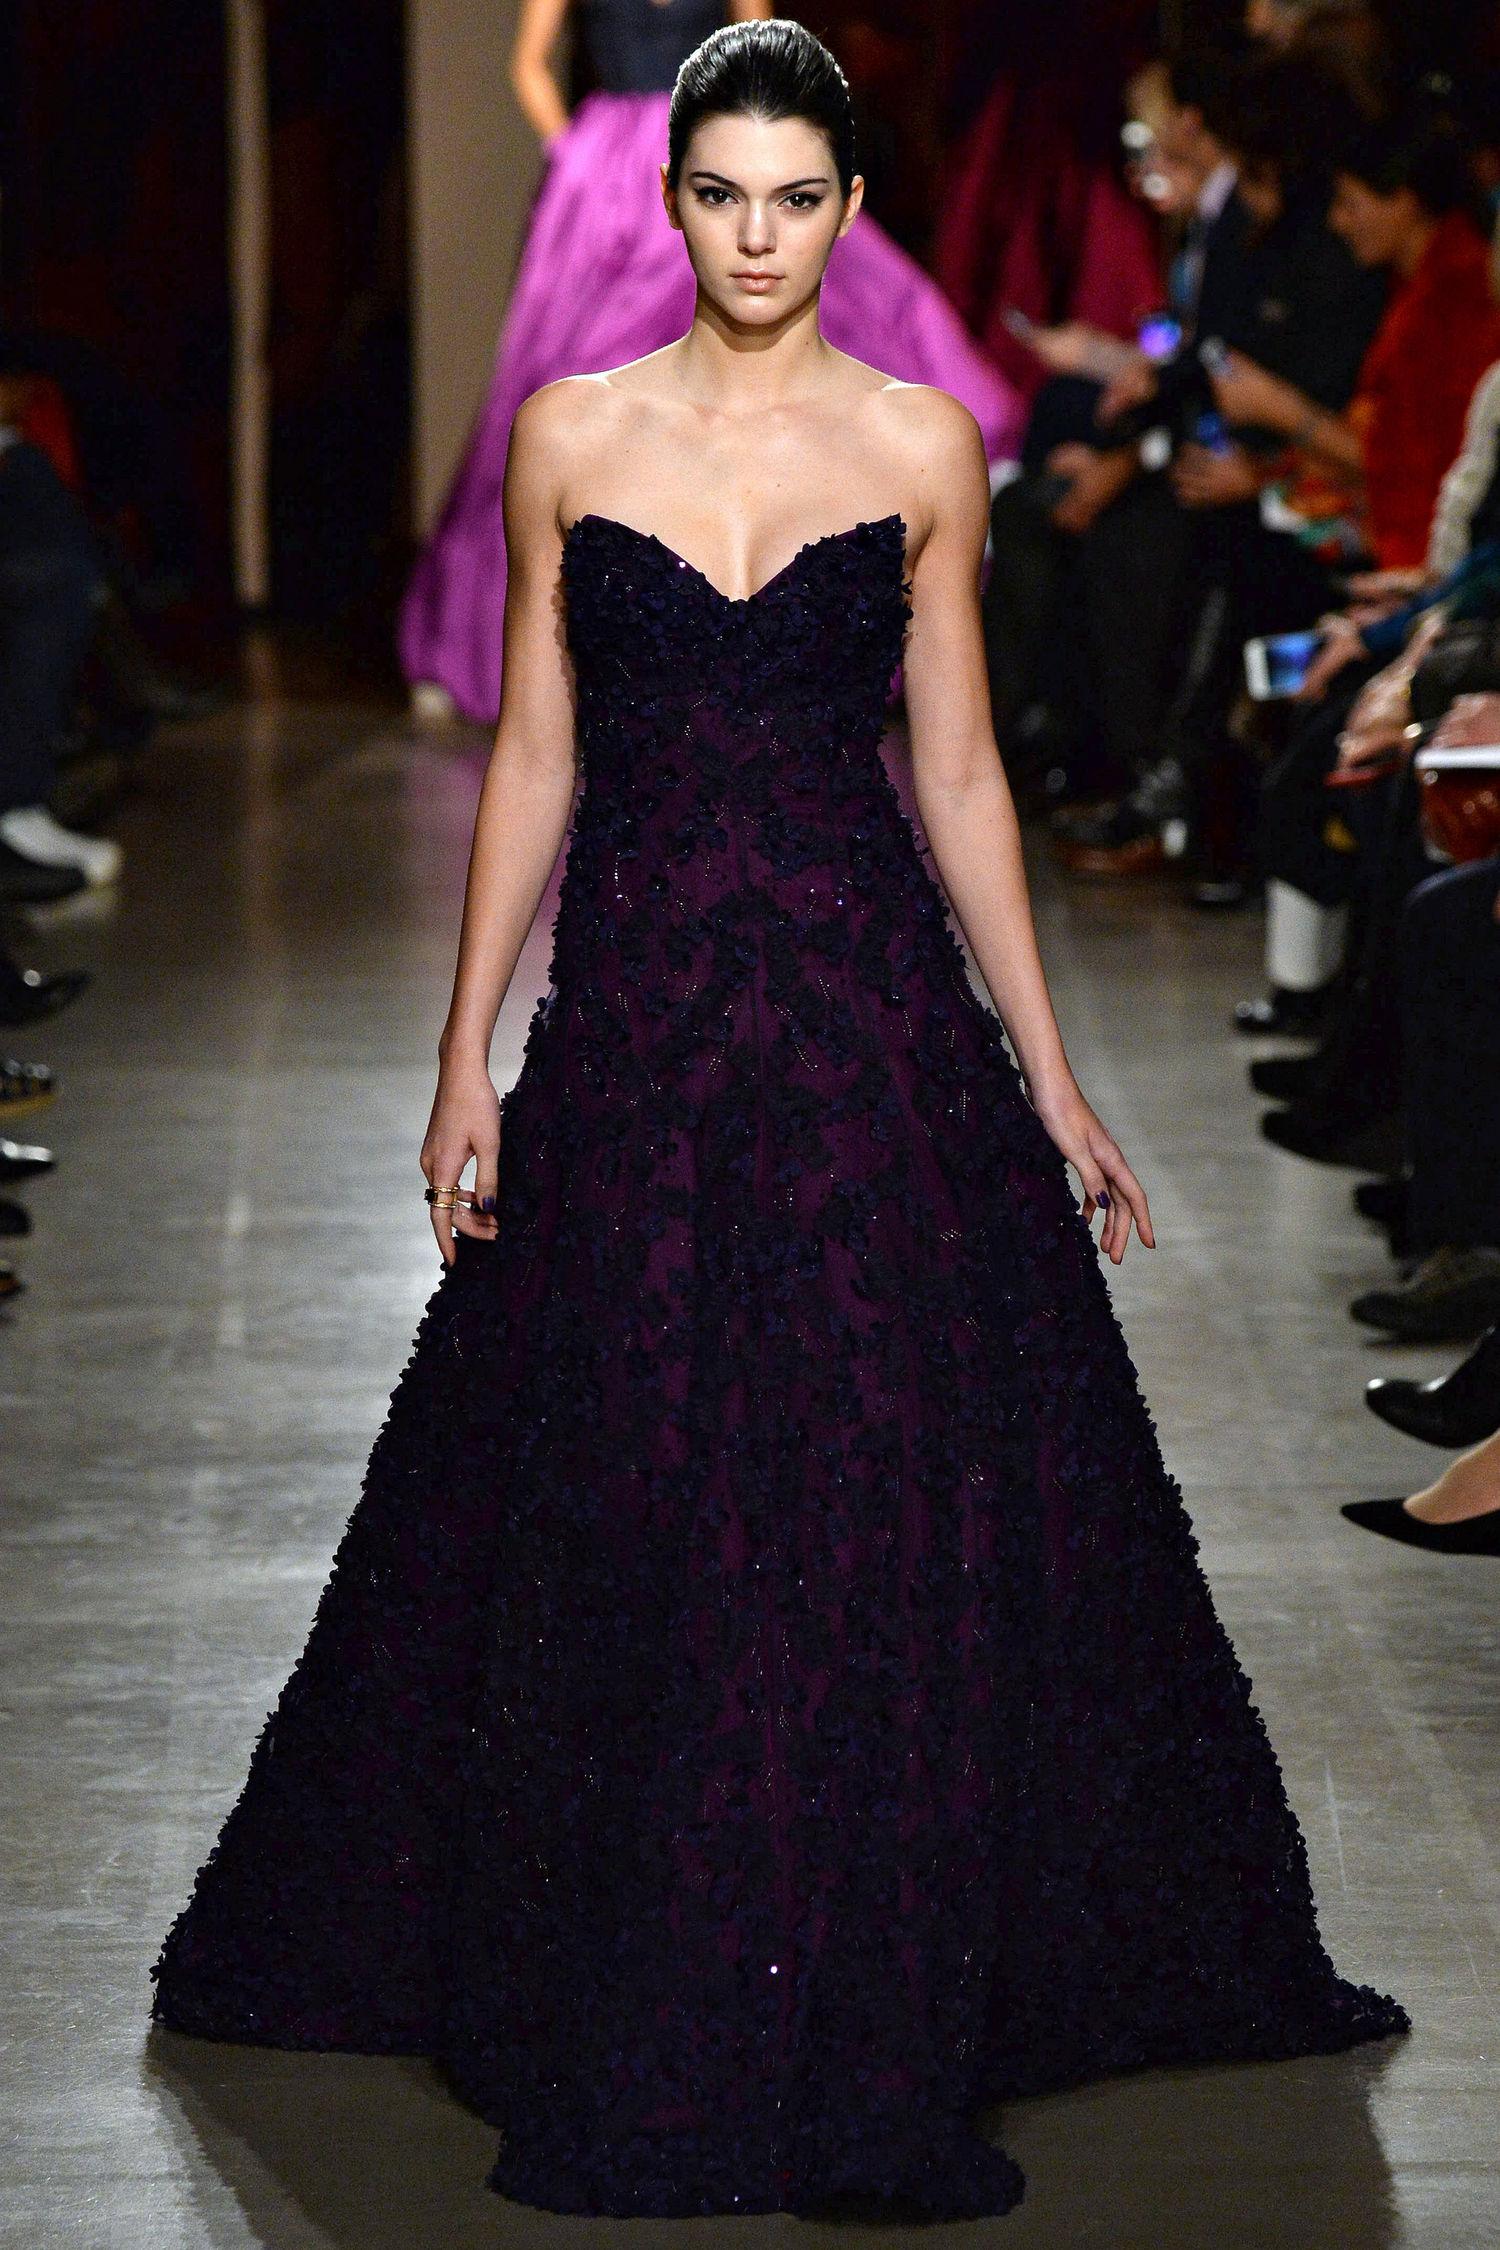 Foto de Kendall jenner en las Semanas de la Moda (13/17)